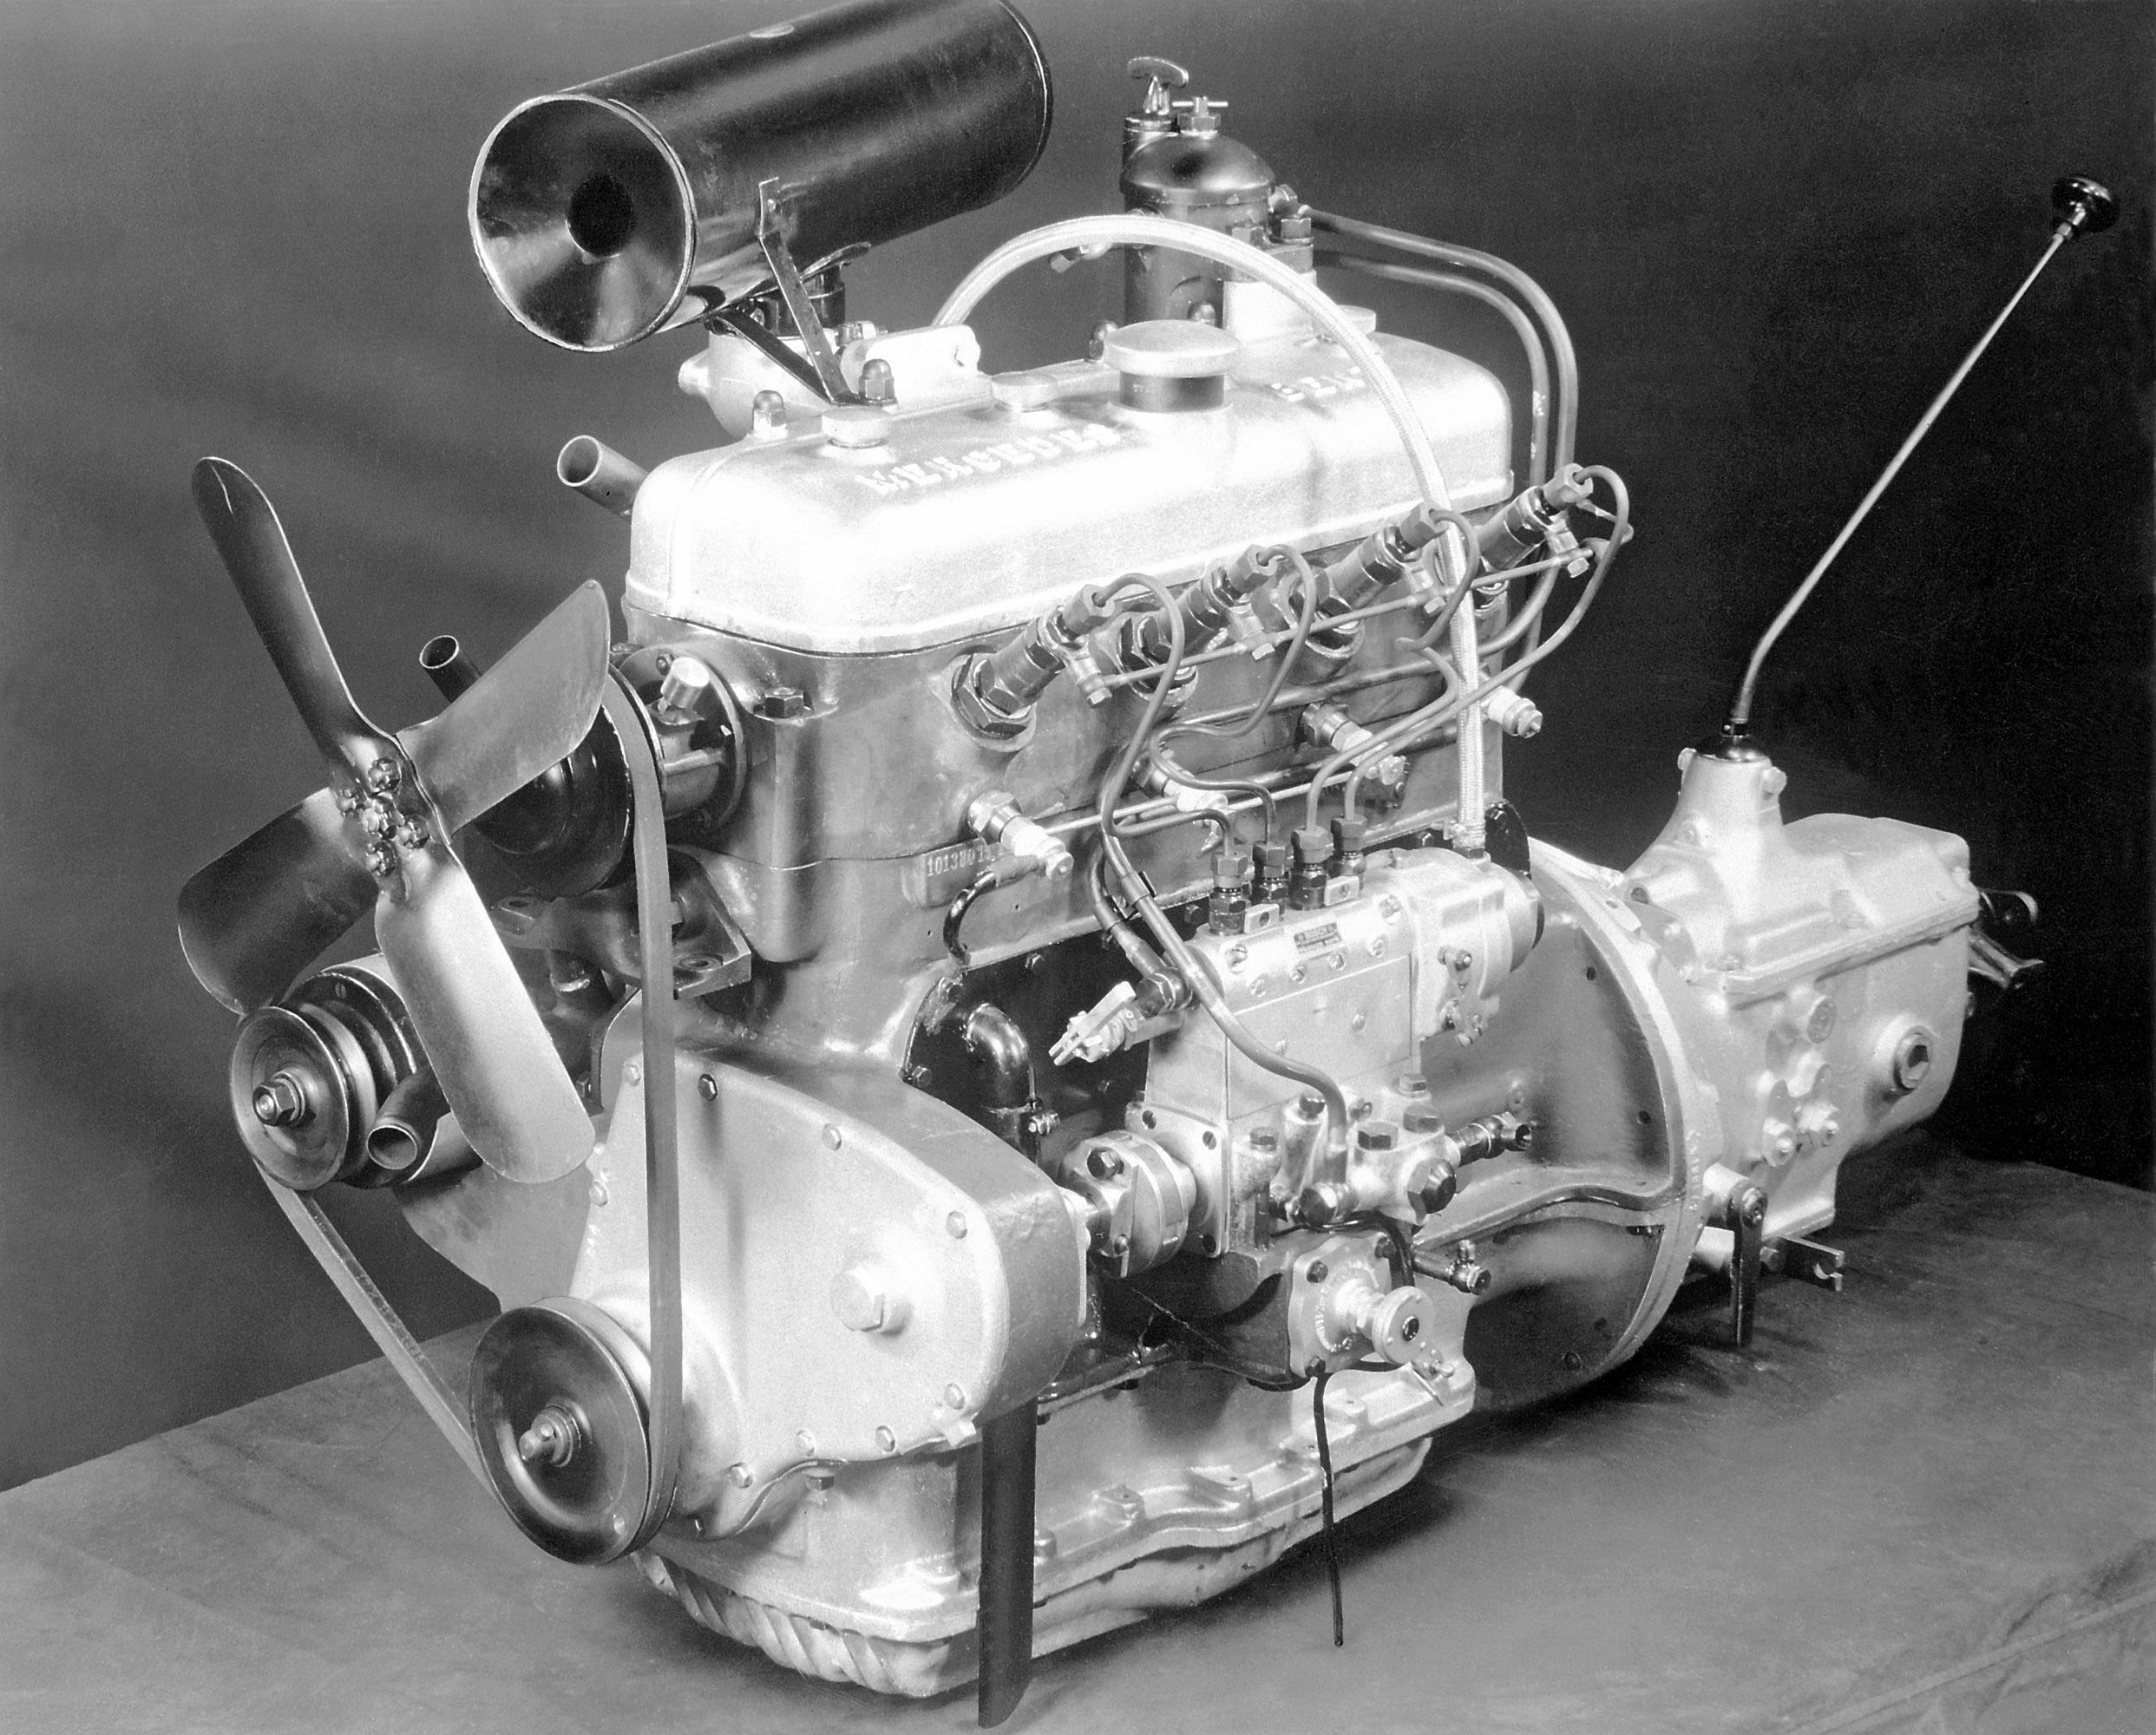 sprinter benz engine diesel review engines mercedes of elegant